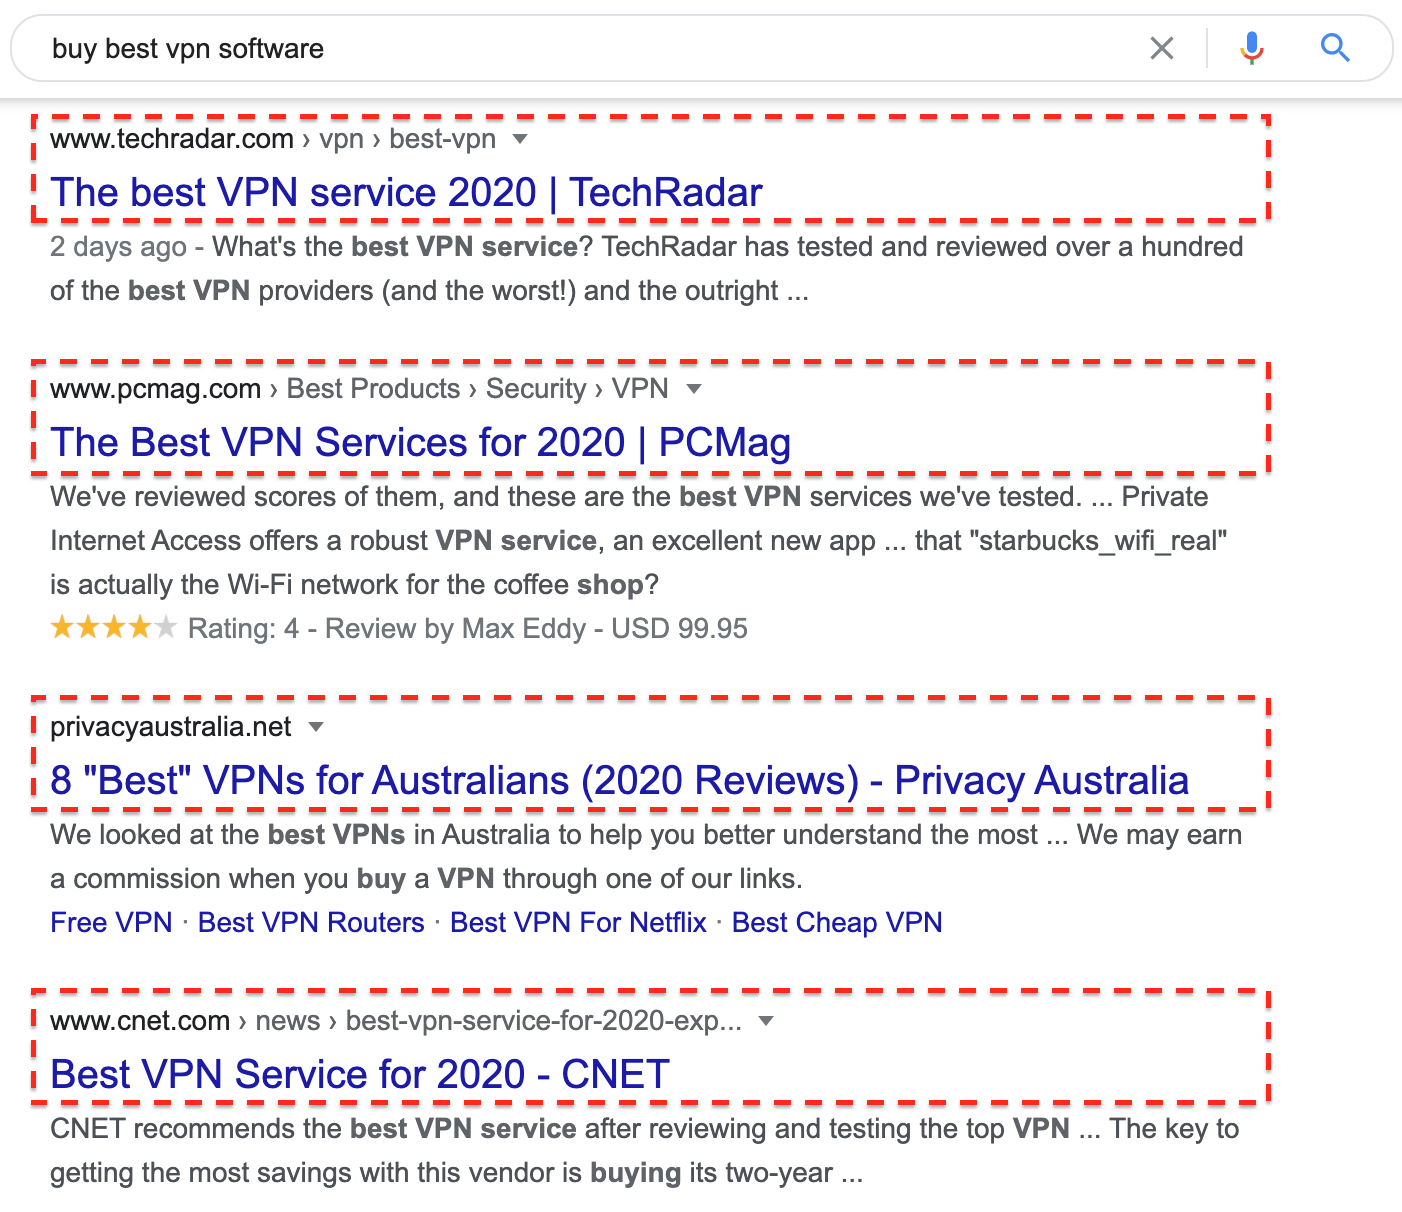 "Google search for ""buy best vpn software"" from an Australian IP"